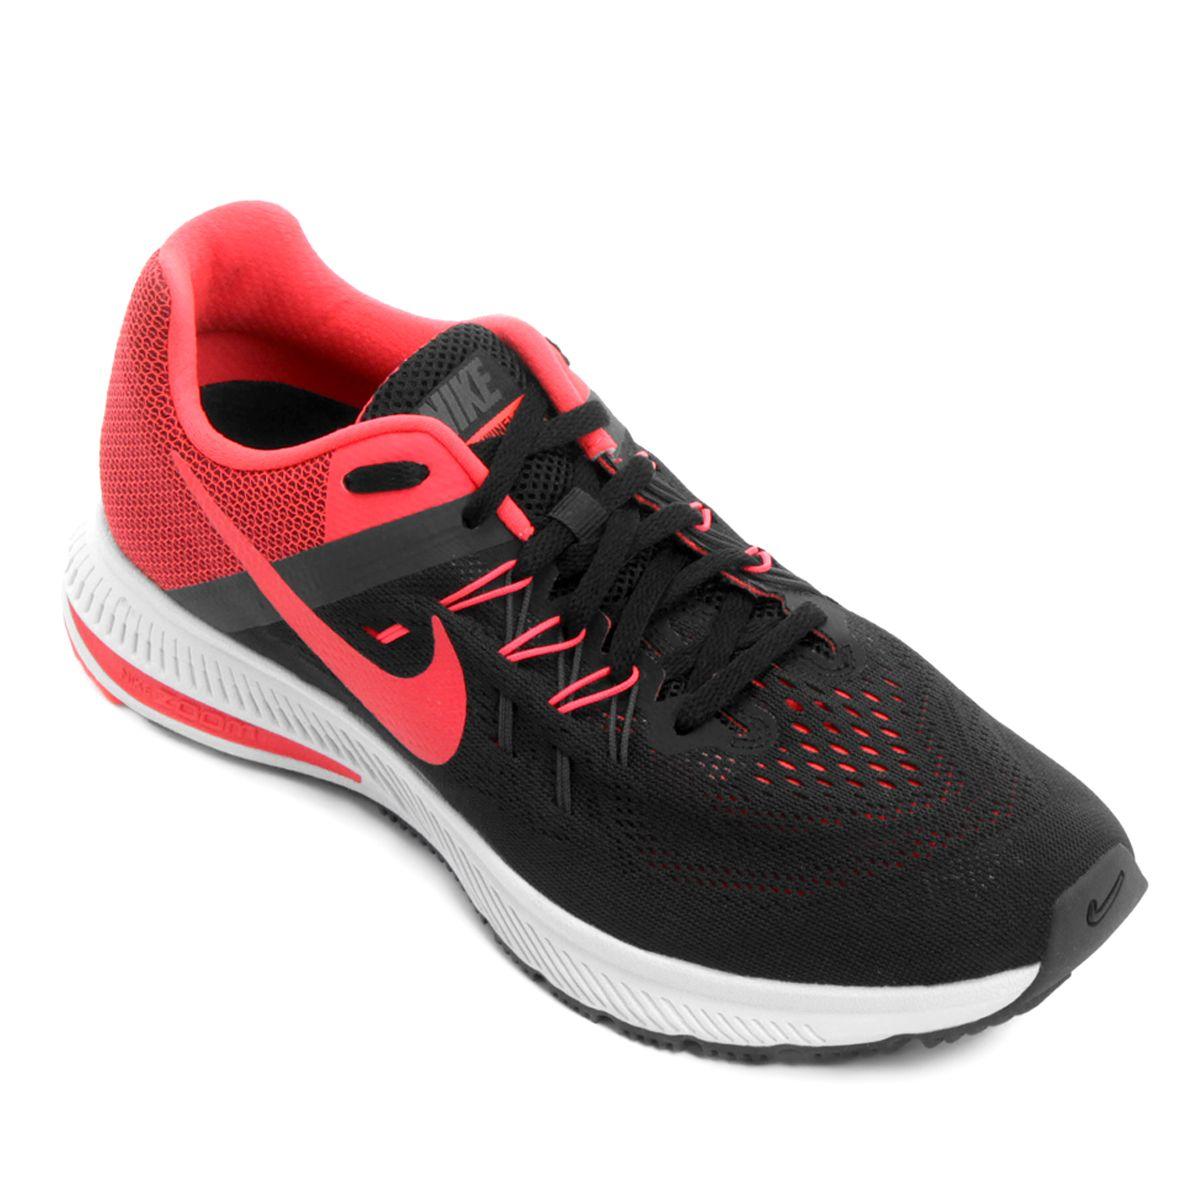 4d71f14d7e Tênis Nike Zoom Winflo 2 Masculino - Preto e Rosa | Sapatos ...